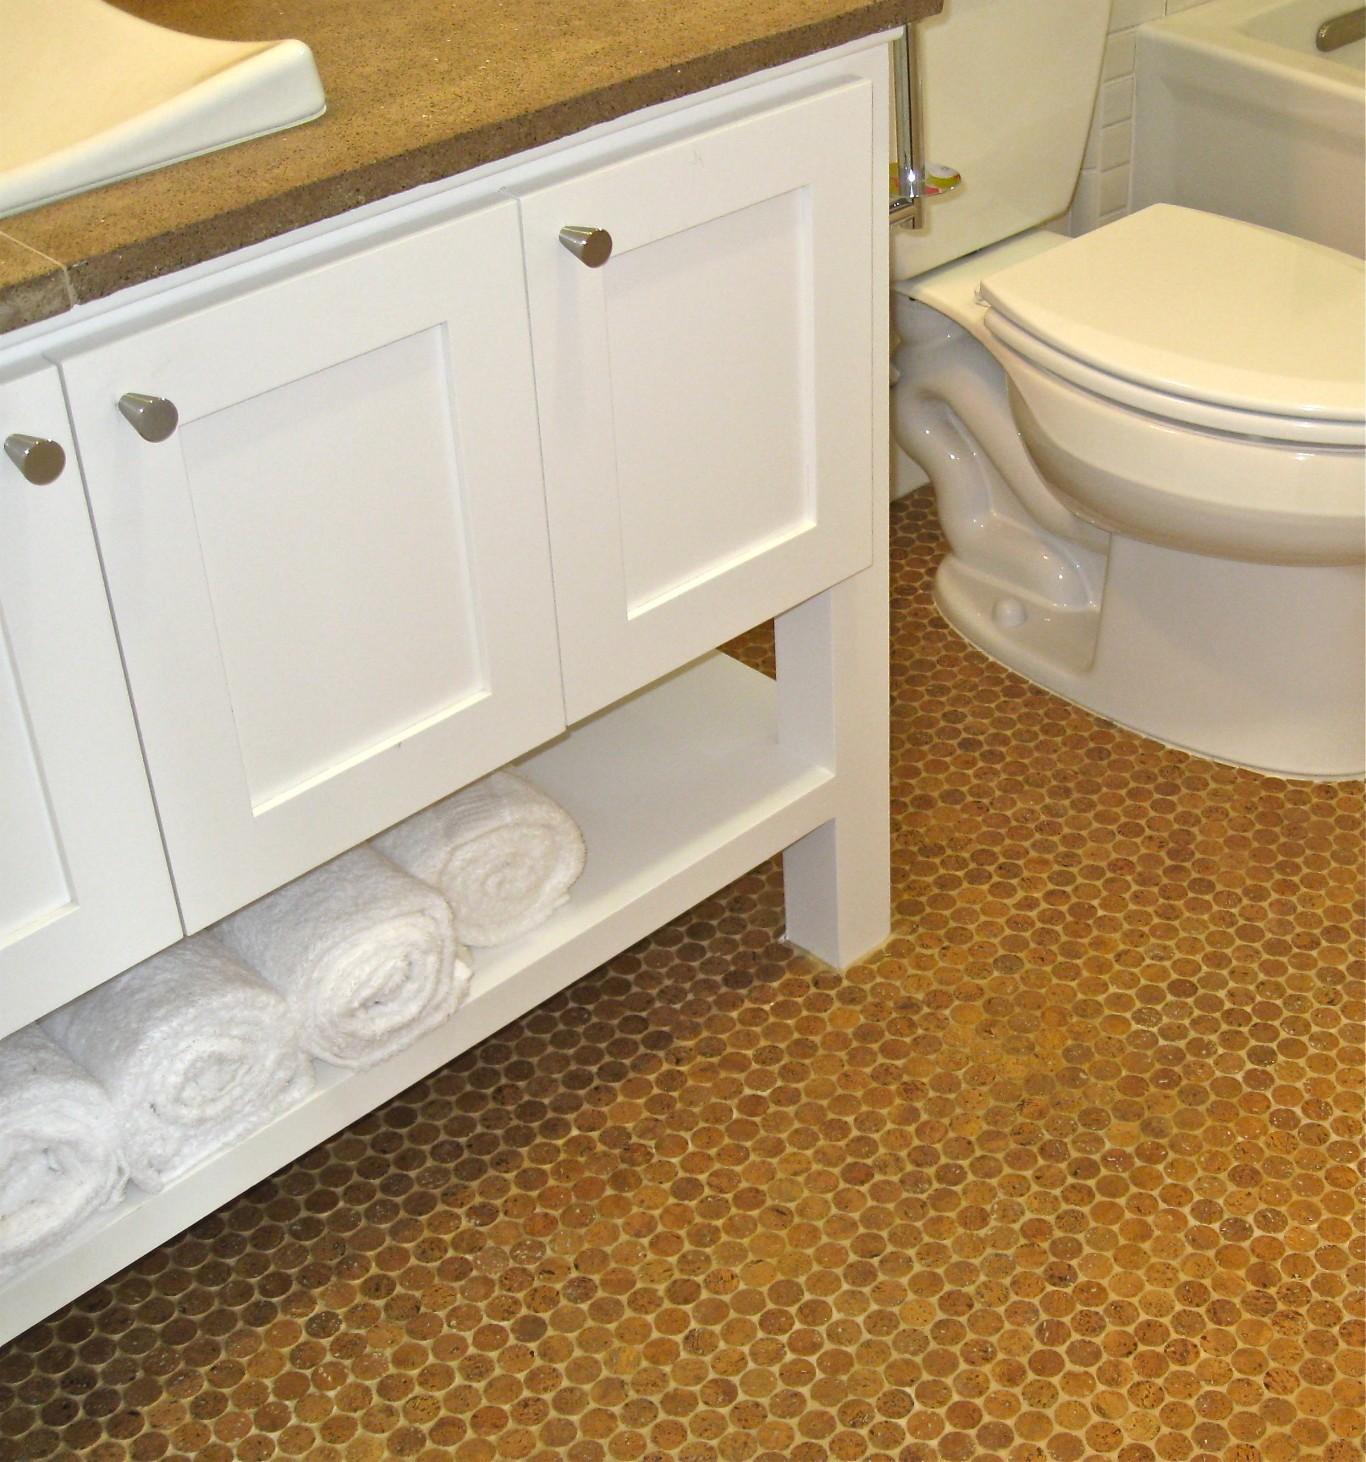 Cork Flooring For Bathroom Fancy In Model